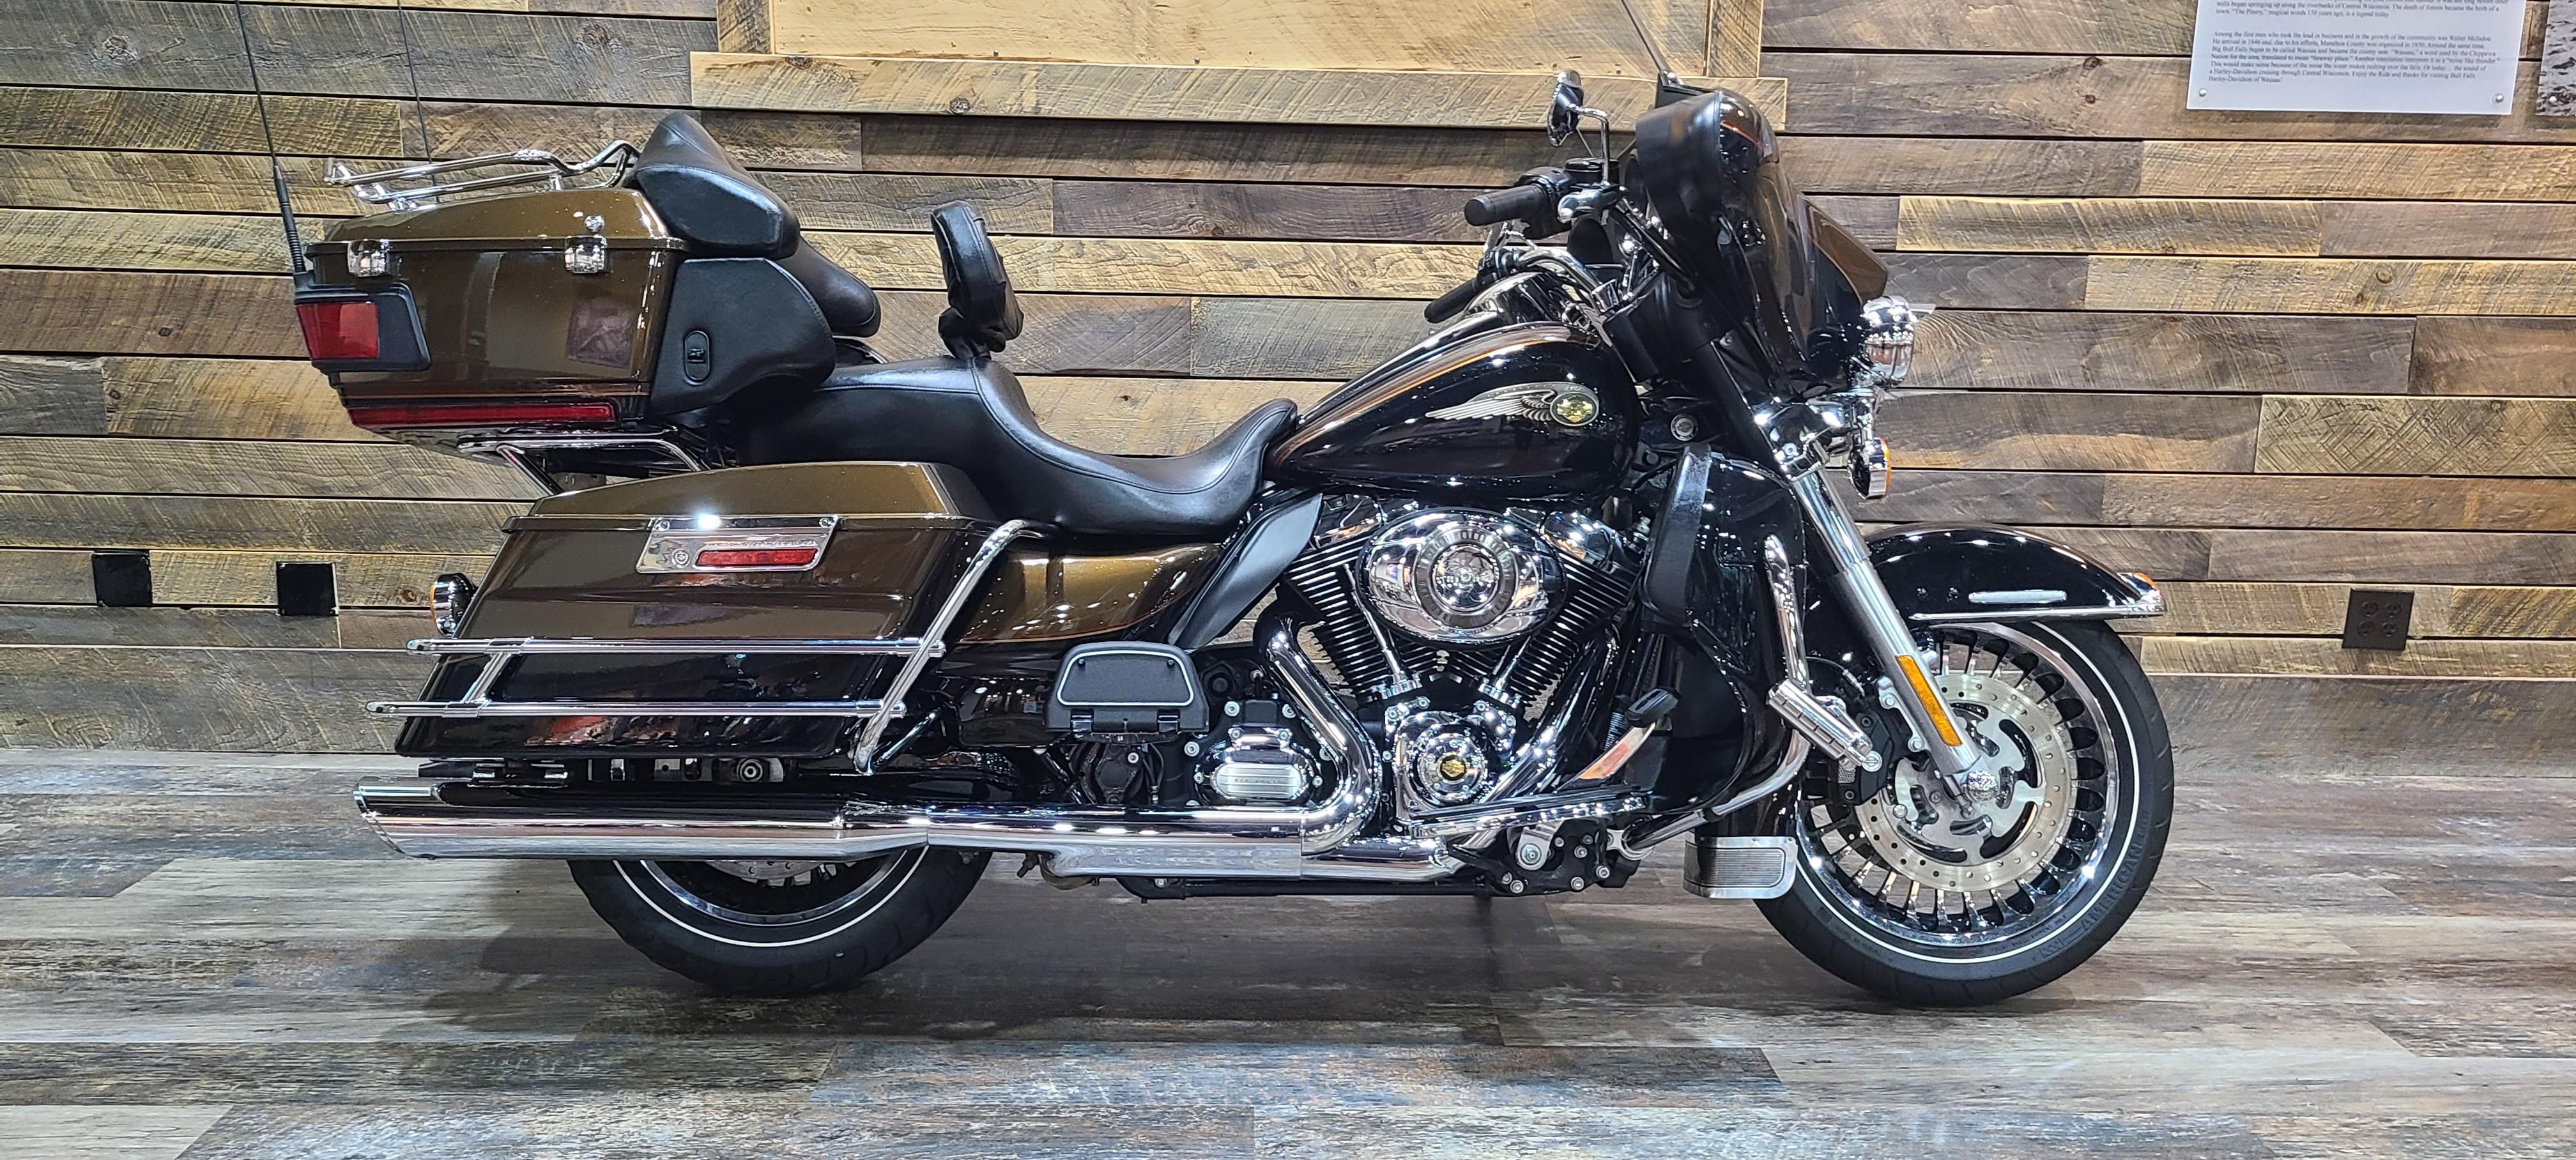 2013 Harley-Davidson Electra Glide Ultra Limited 110th Anniversary Edition at Bull Falls Harley-Davidson